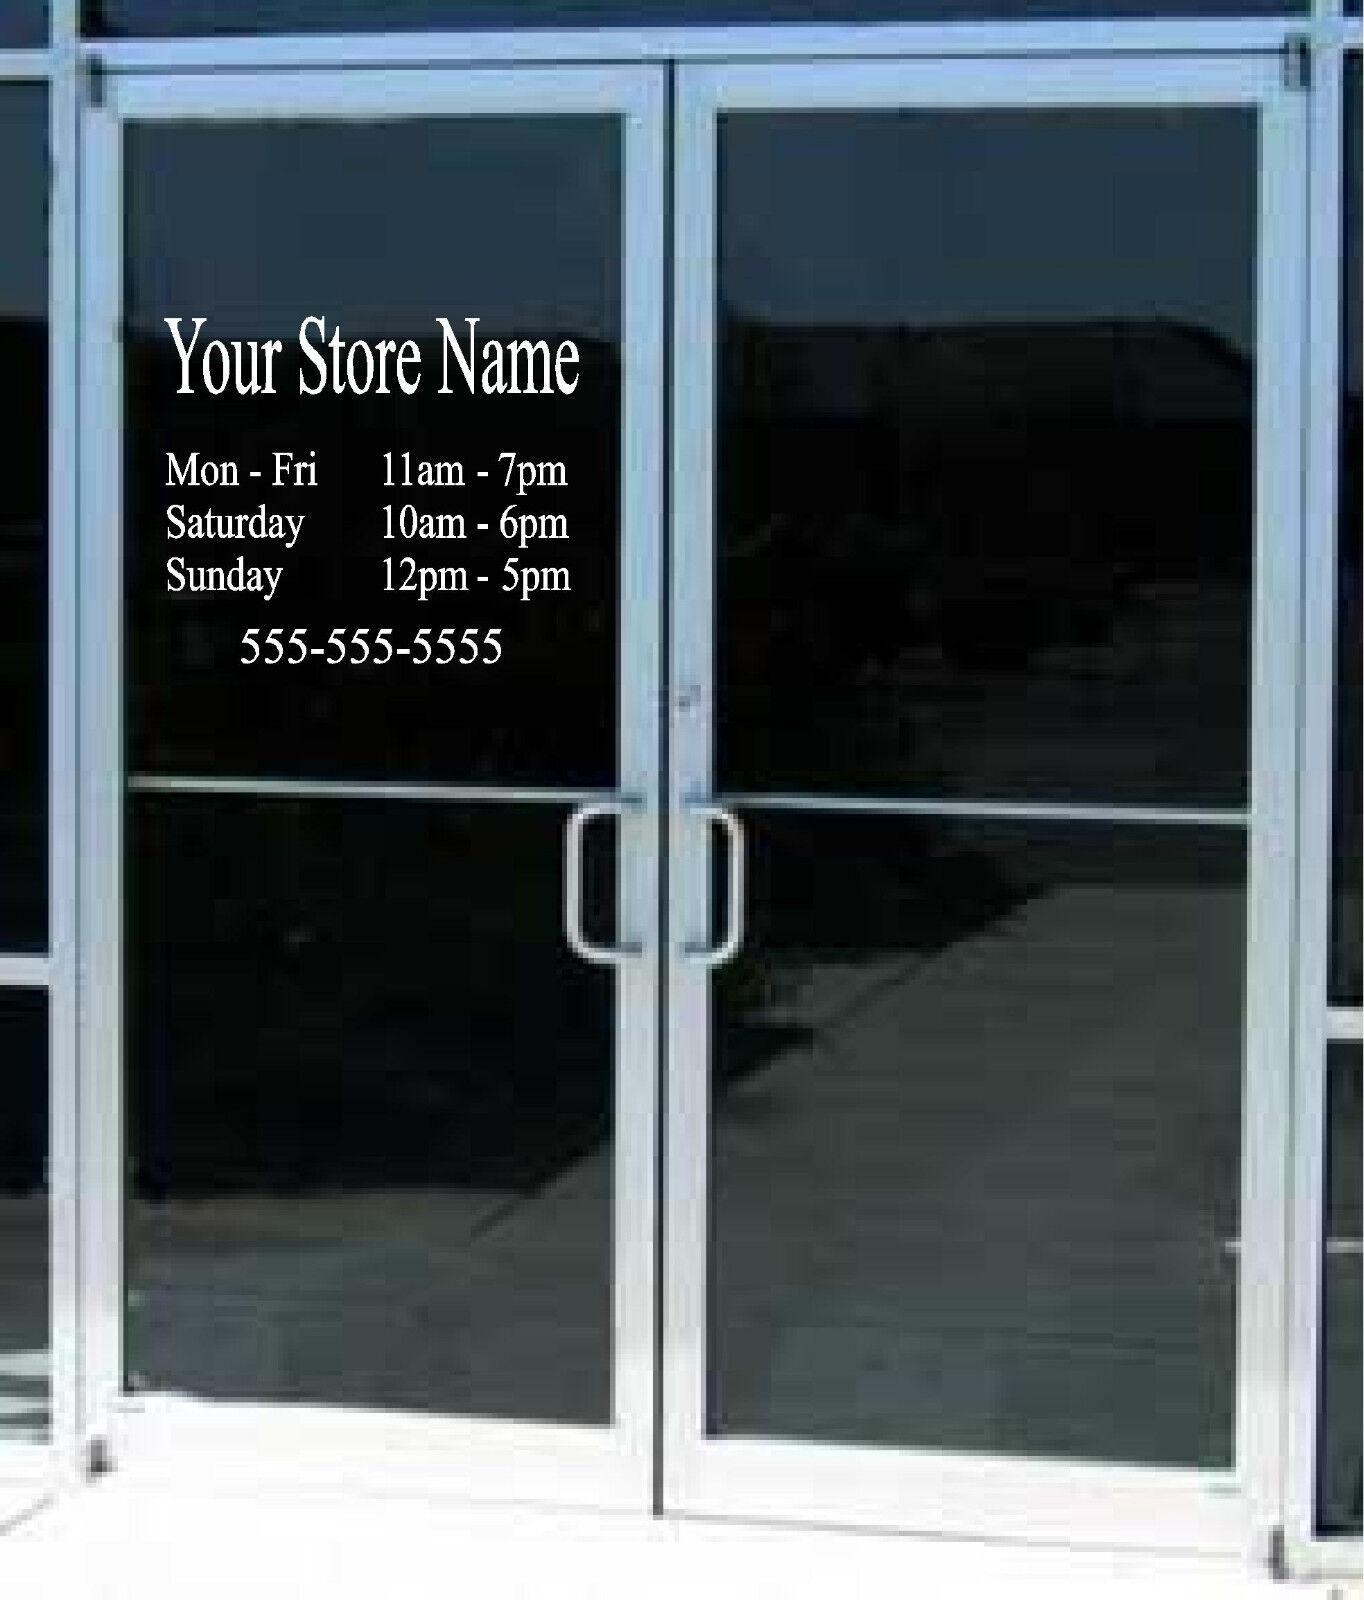 Custom Business Hours Sign Vinyl Decal Sticker X Window Door - Custom vinyl decal stickers for business